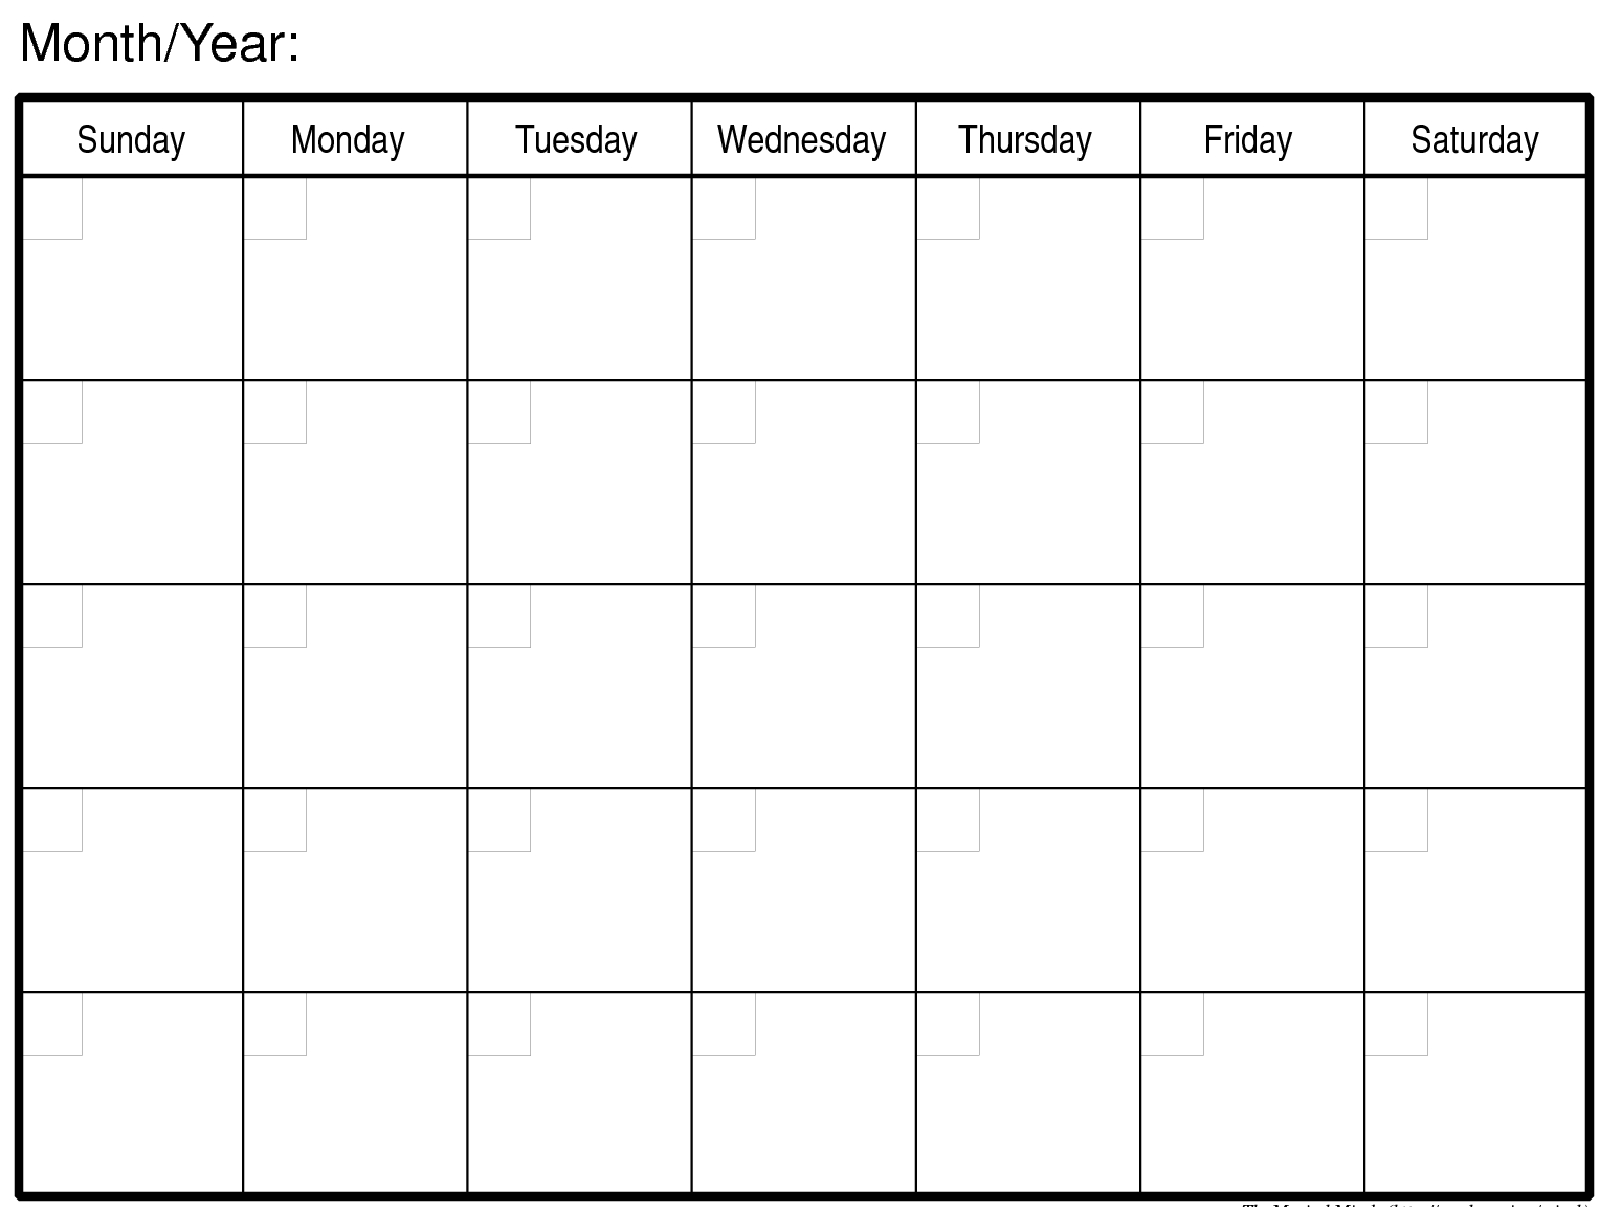 Monthly Calendar | Turexa | Blank Monthly Calendar, Monthly Blank Monday Through Friday Month Calendar Template